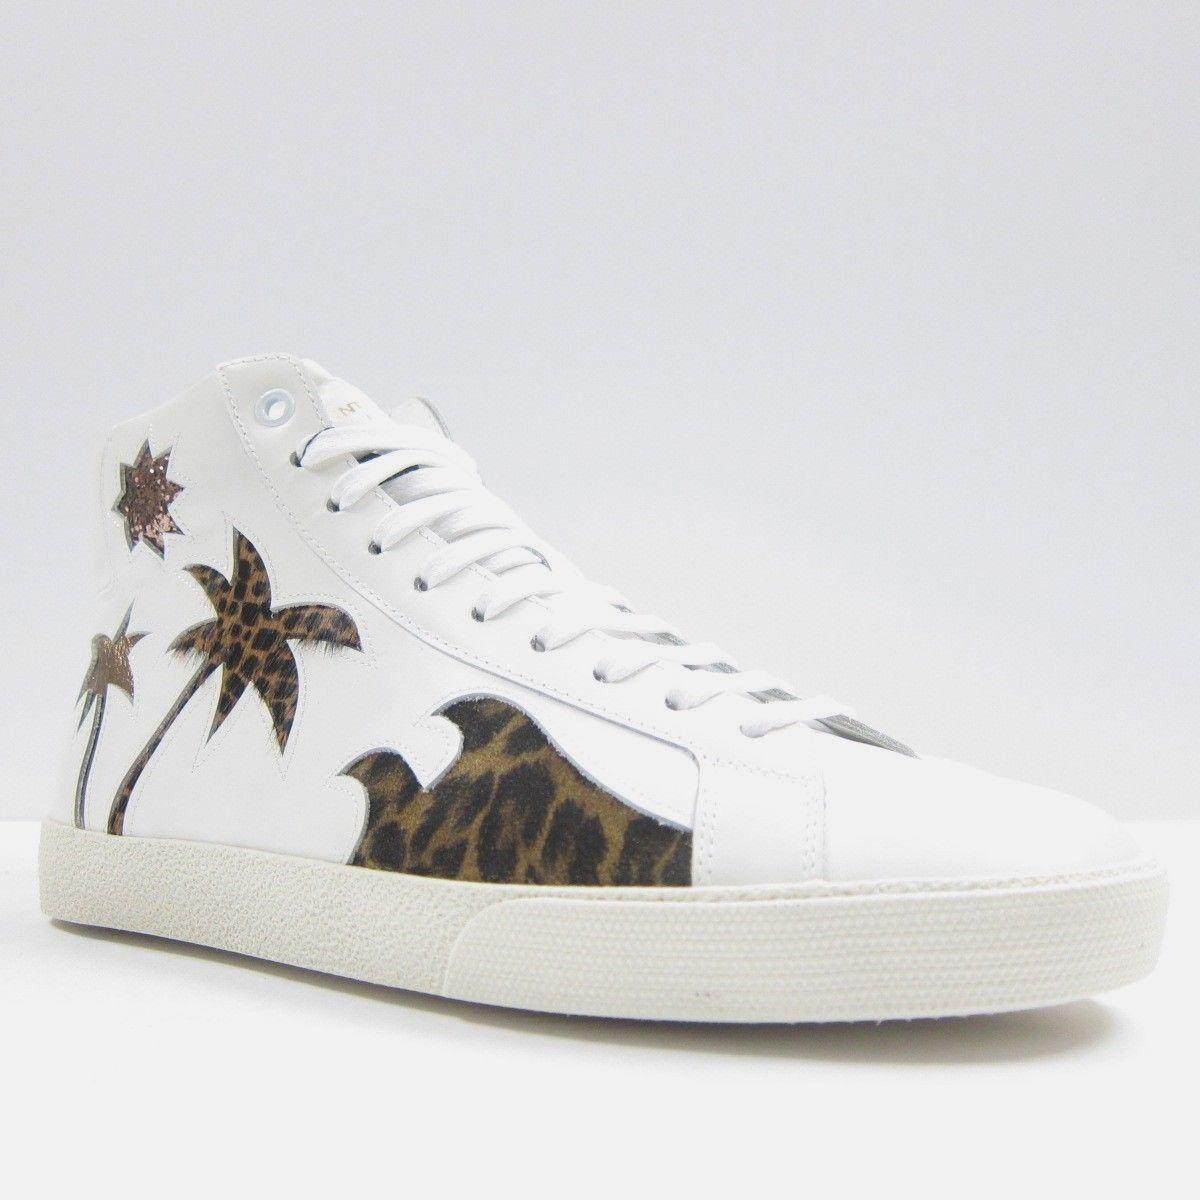 Scarpe casual da uomo  S-2245139 Nuovo Saint Laurent di Lana Bianco Ghepardo Sneaker Hi-Top Taglia